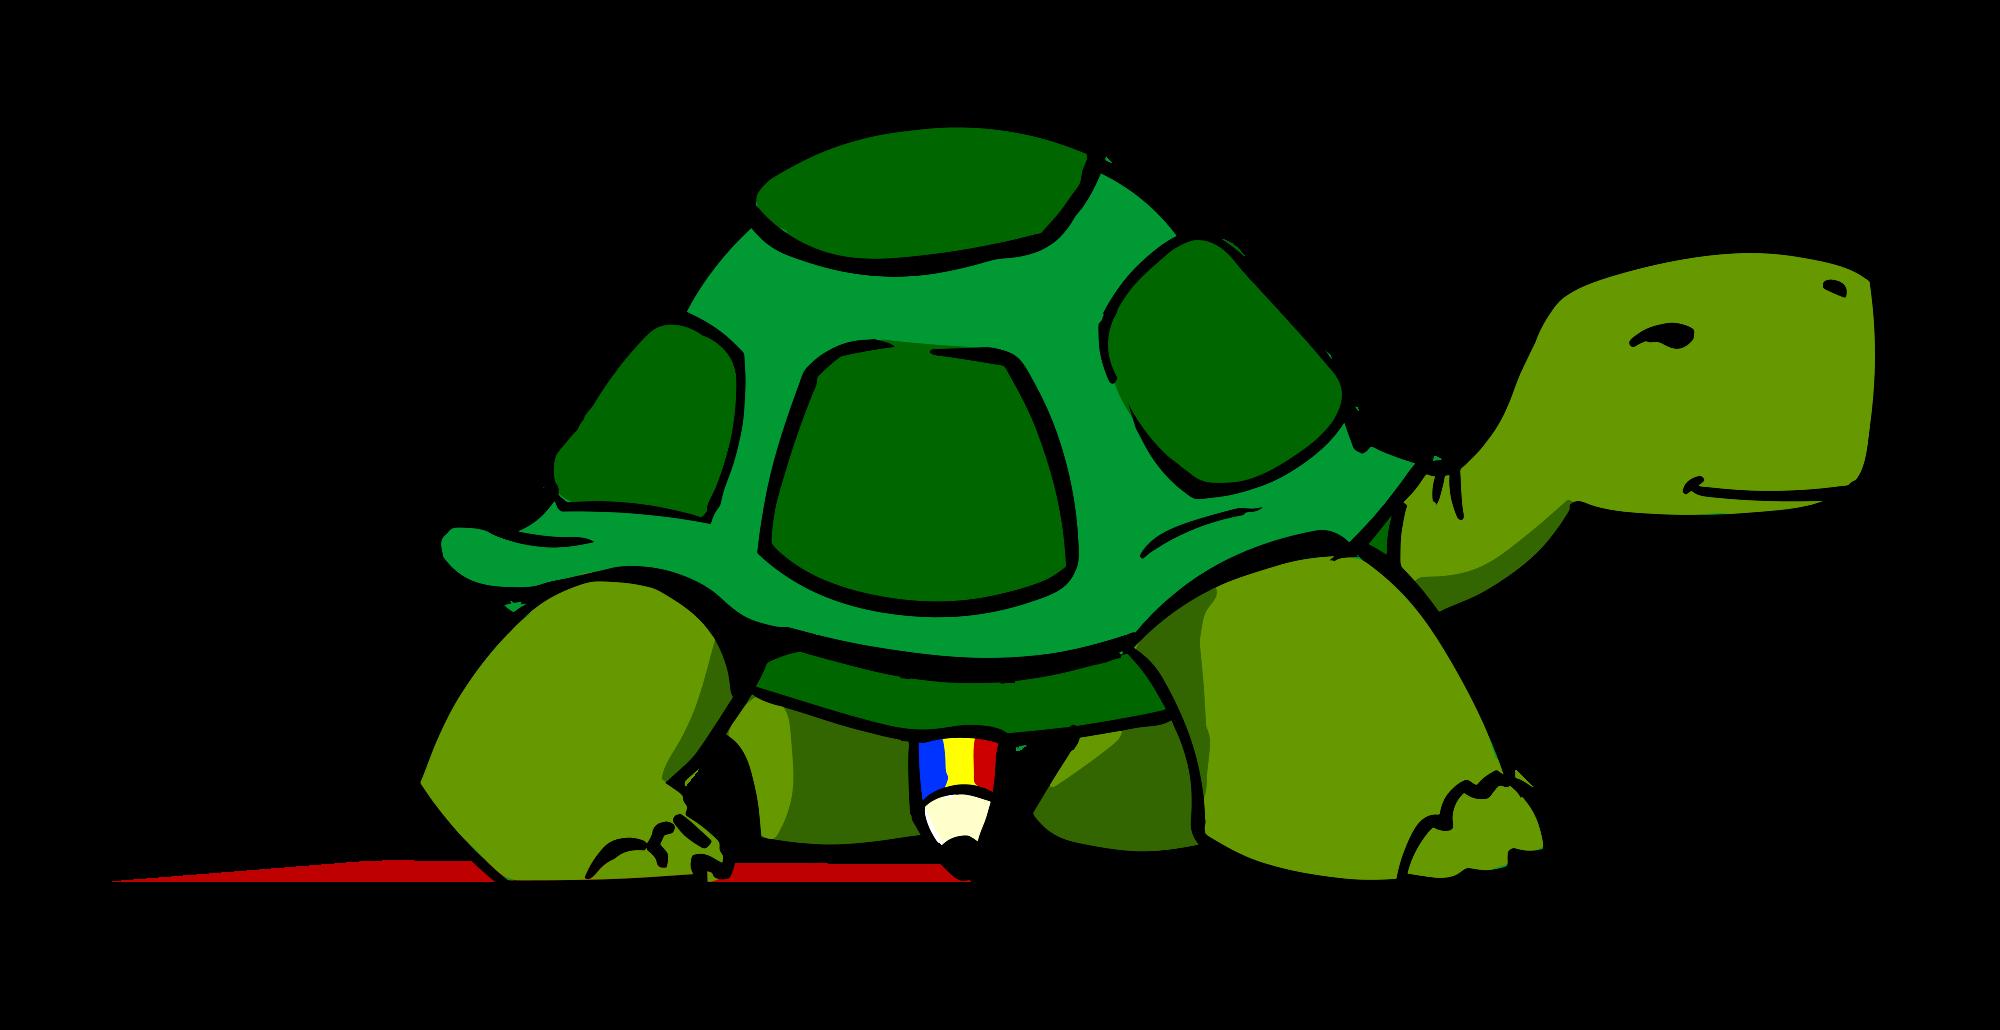 Clipart turtle vector. Cartoon turtles shop of